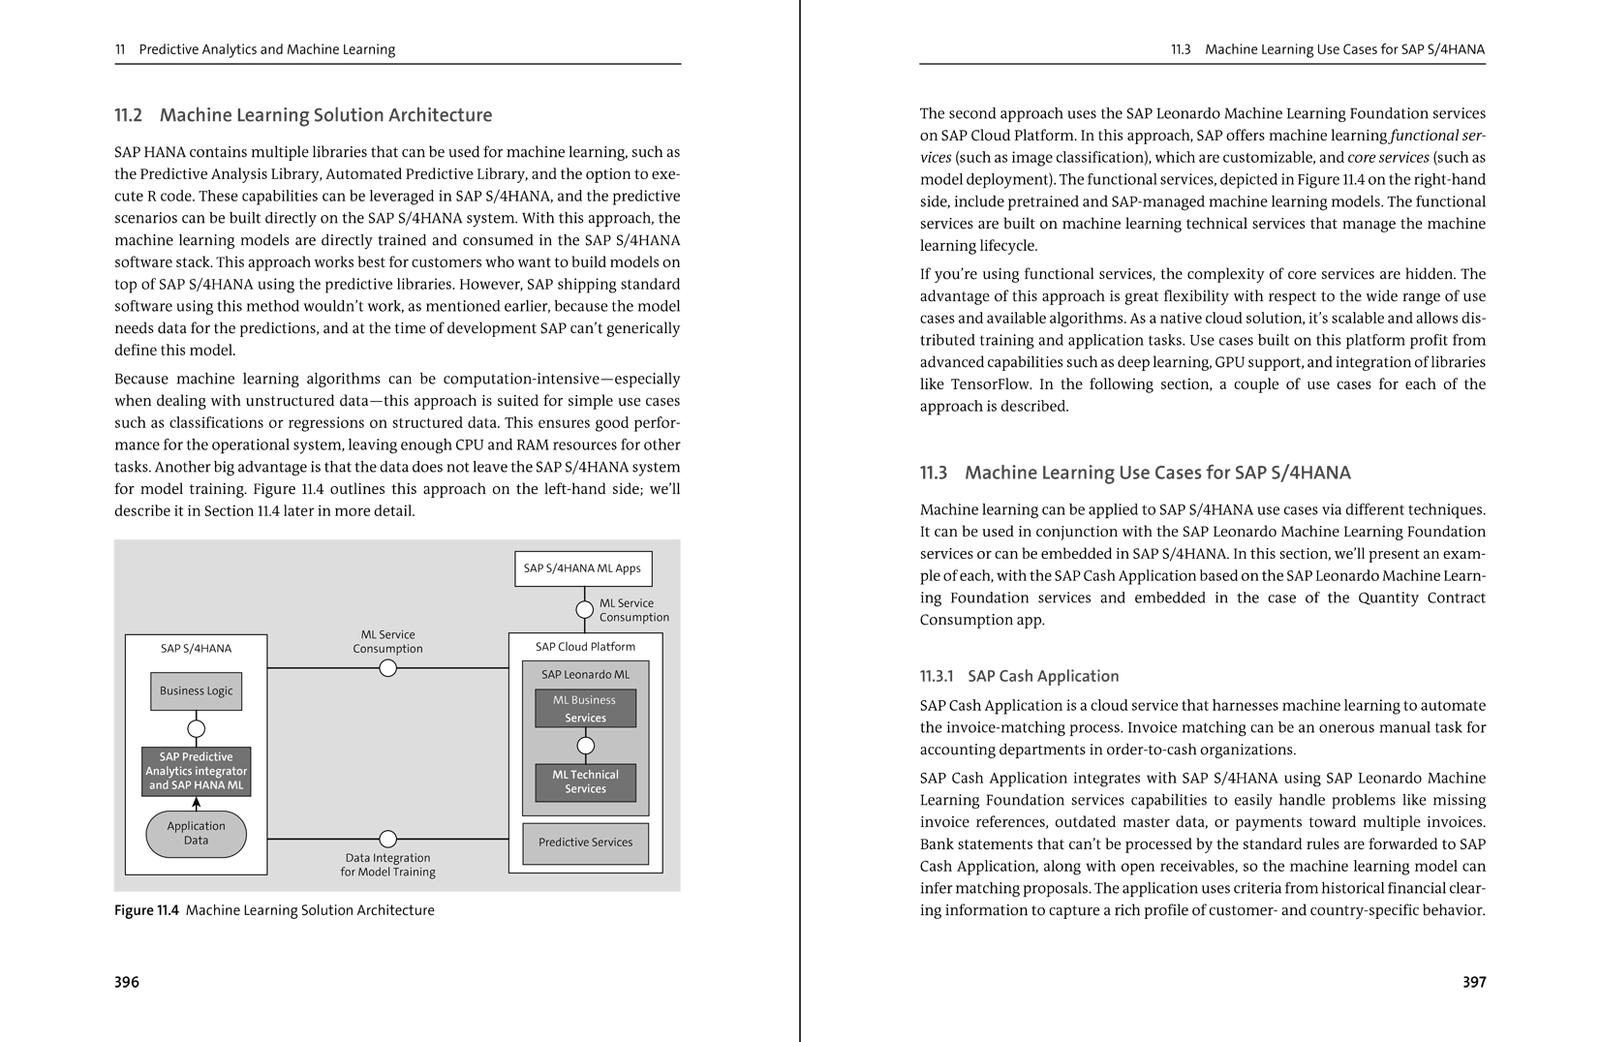 SAP S/4HANA Embedded Analytics - The Comprehensive Guide